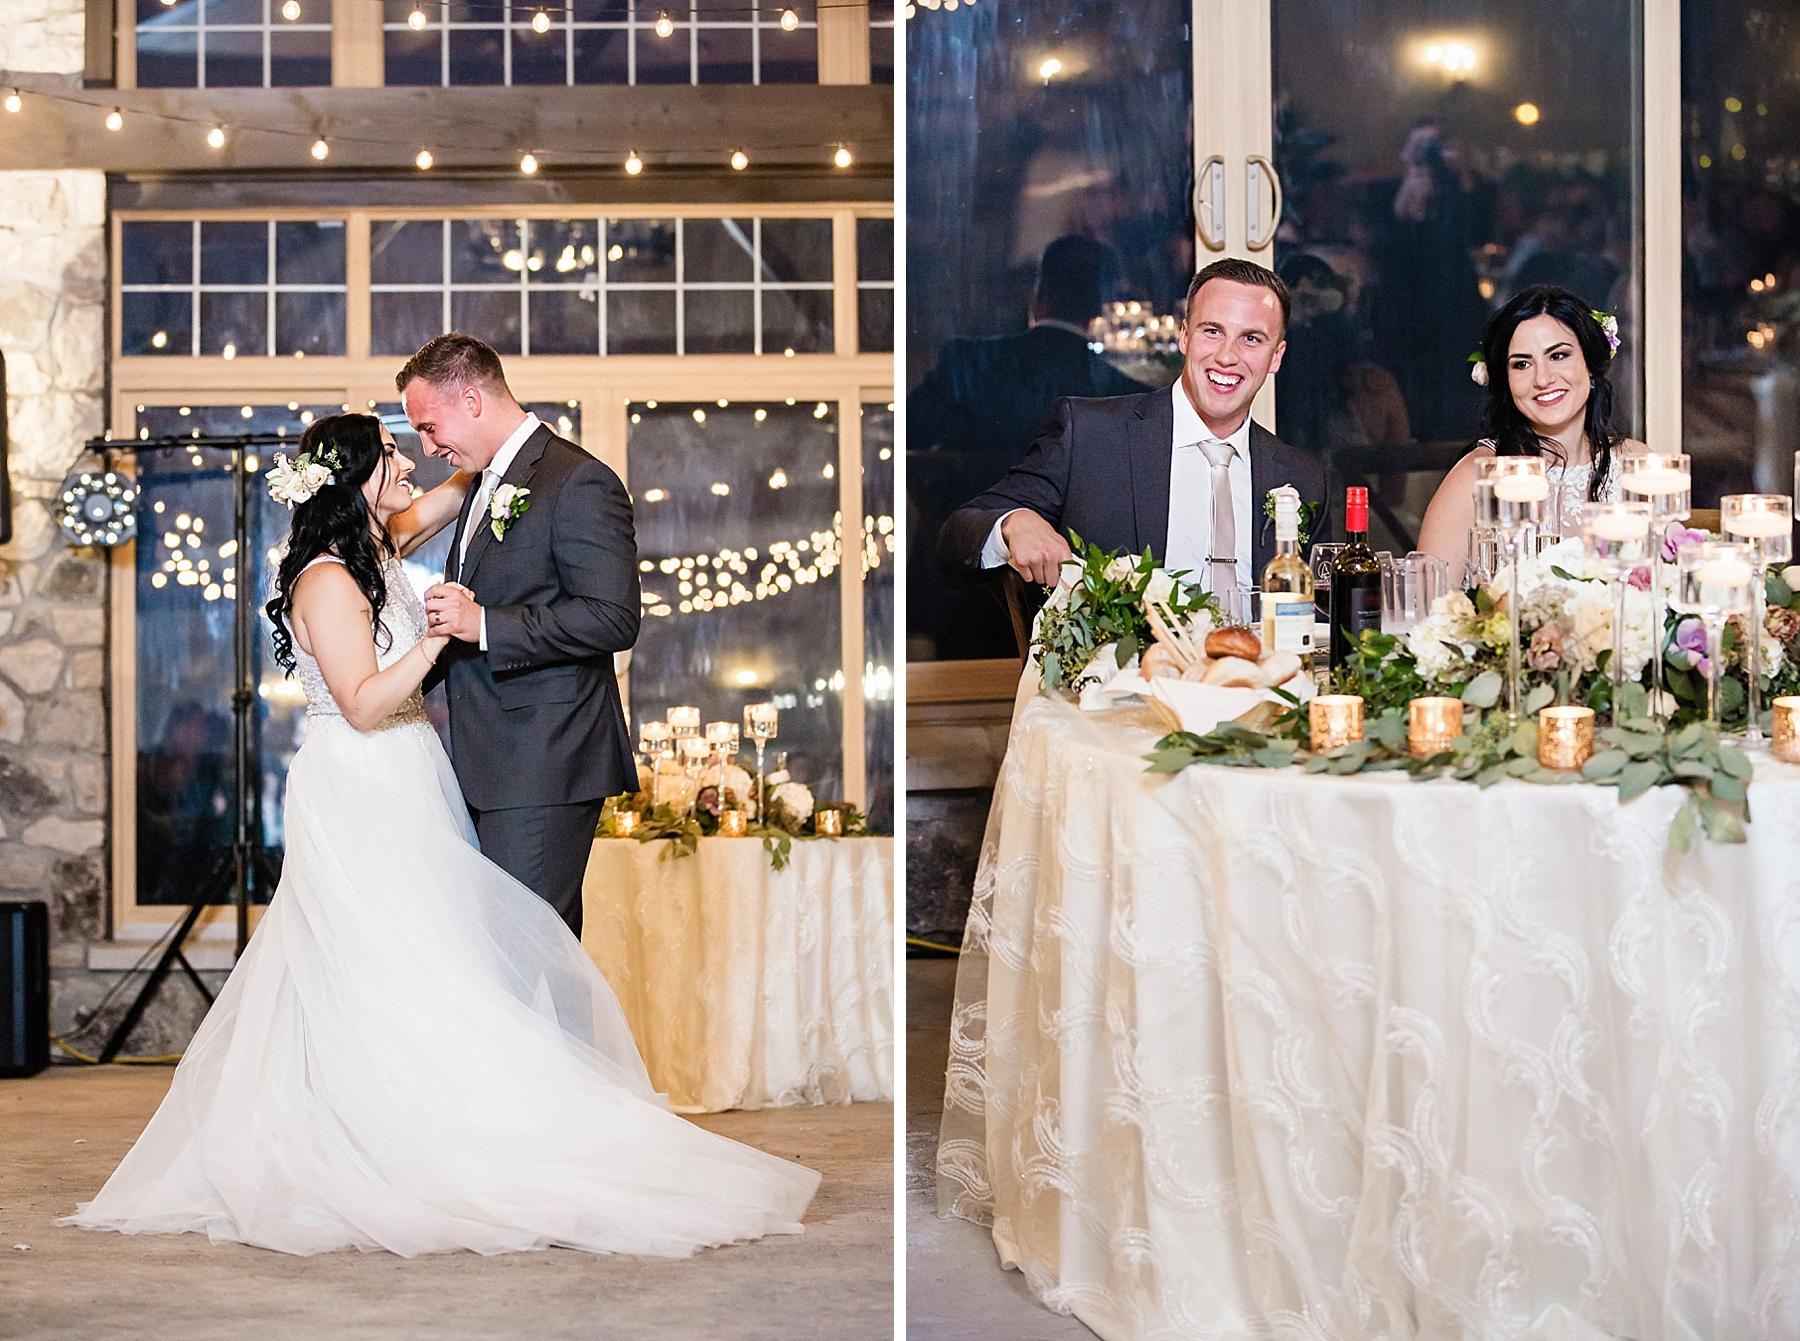 windsor-wedding-photographer-sprucewood-shores-winery-wedding-niagara-on-the-lake-wedding-photographer-eryn-shea-photography_0080.jpg